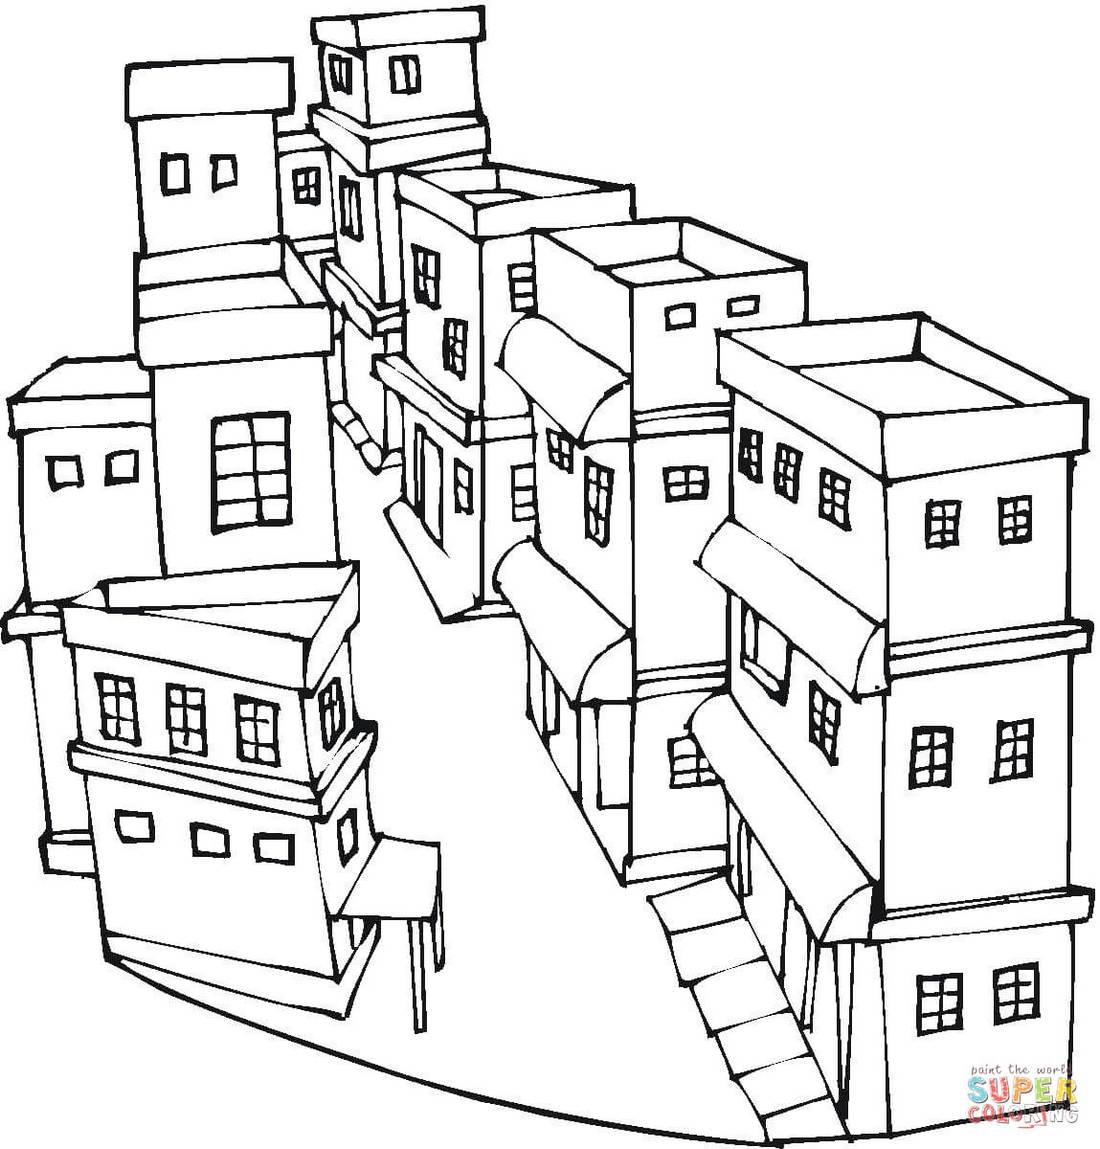 Neighborhood_City_Coloring_Page